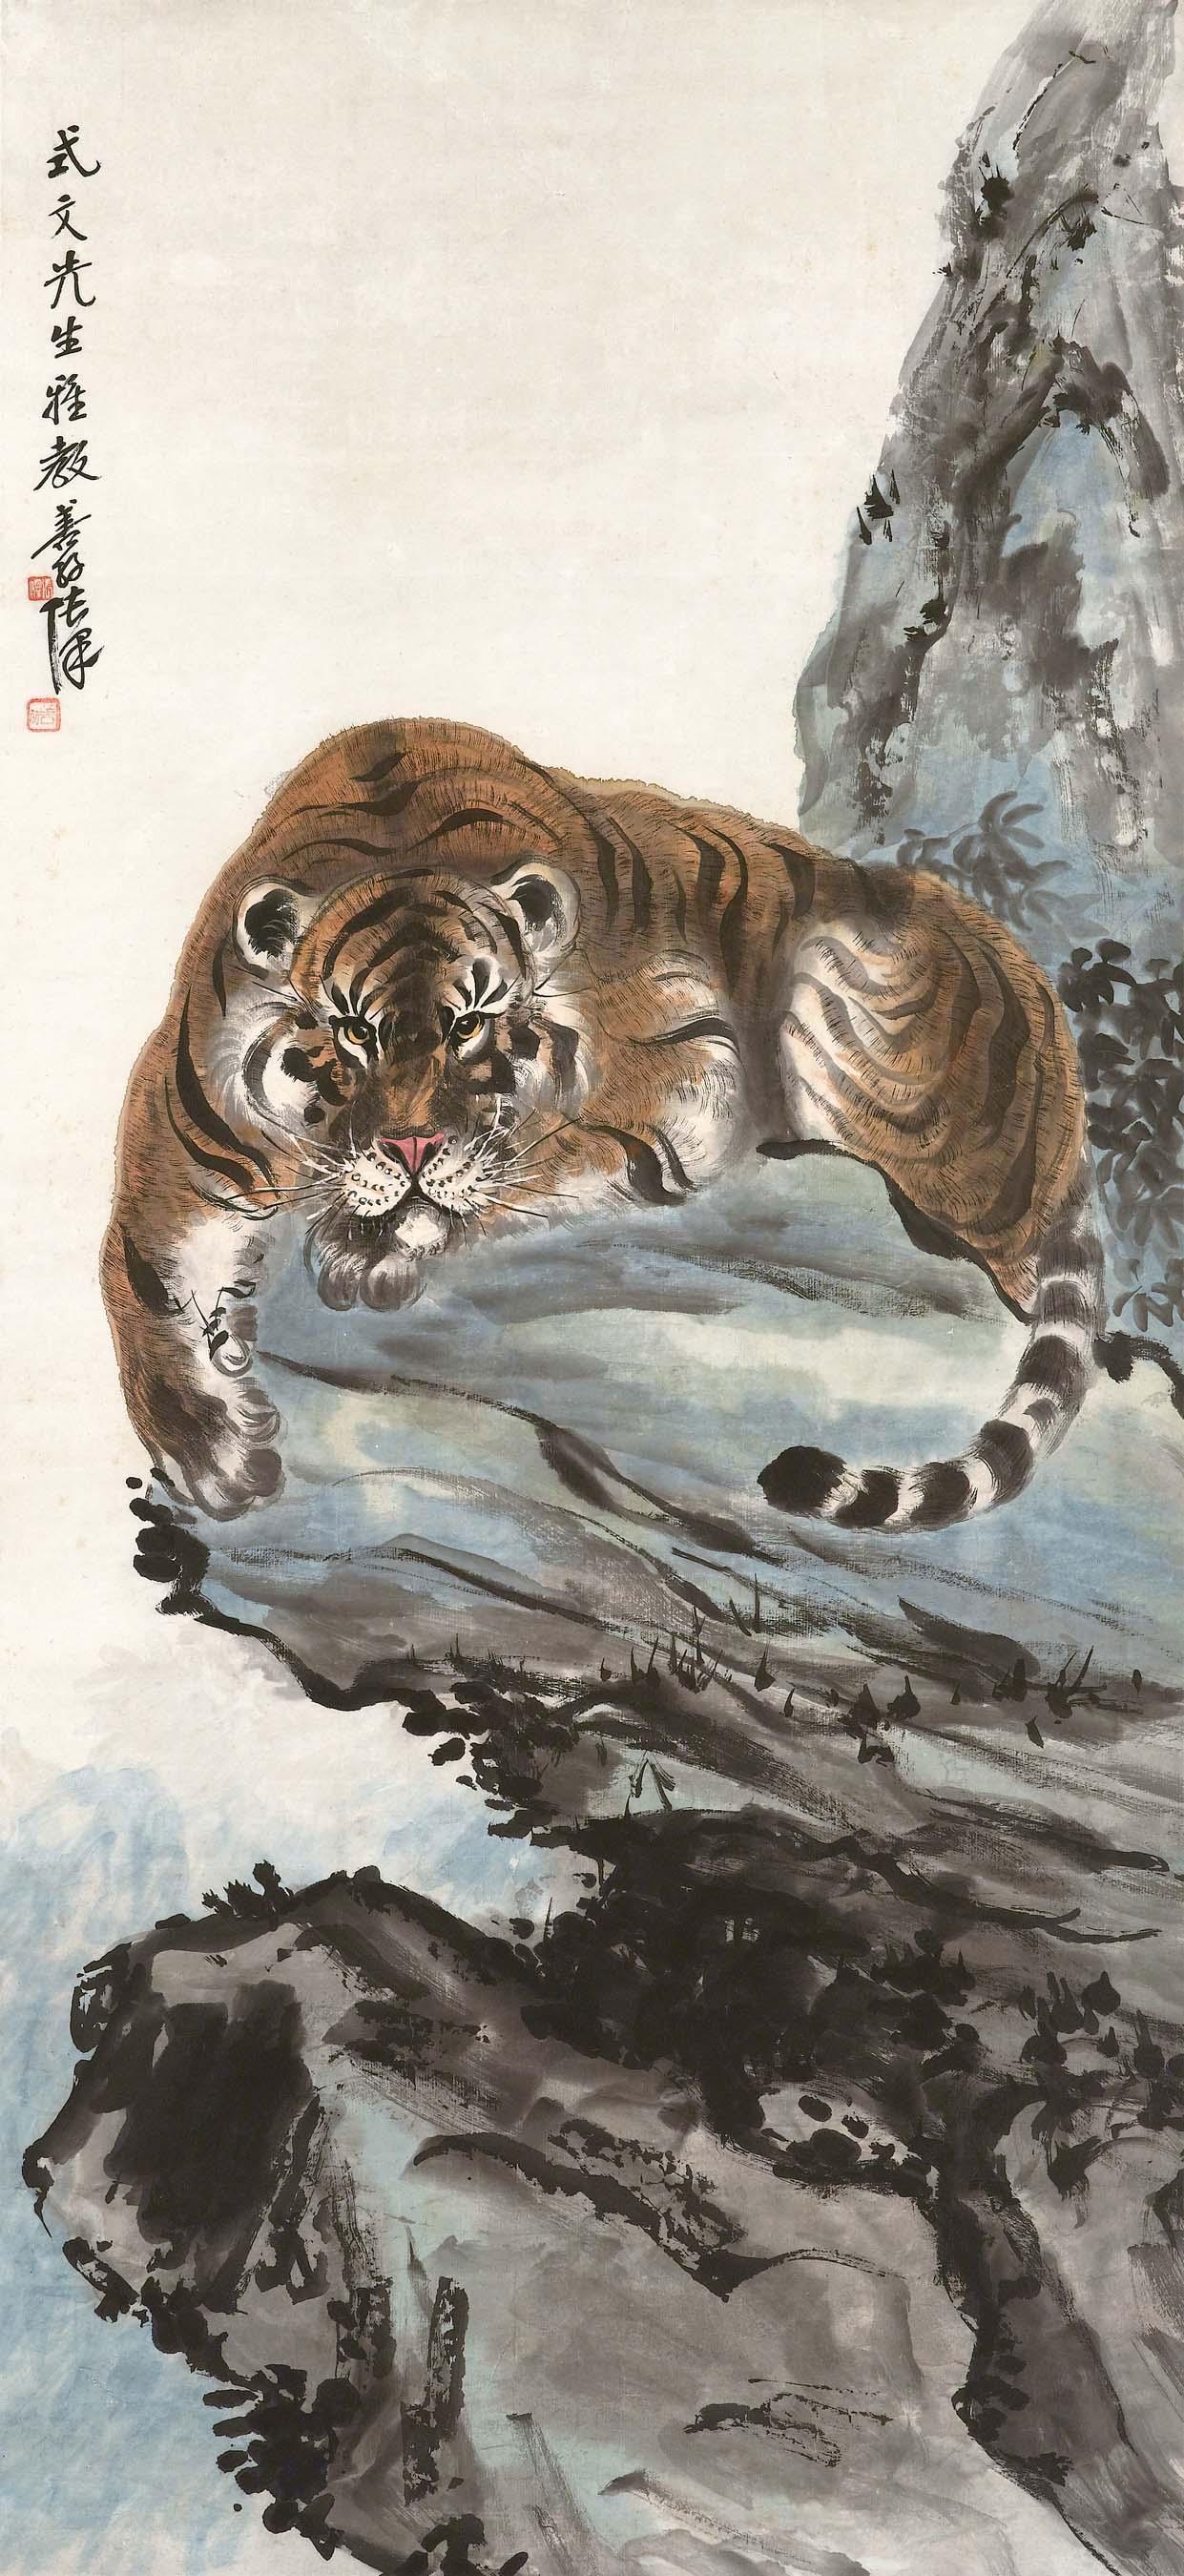 A Tiger's Gaze